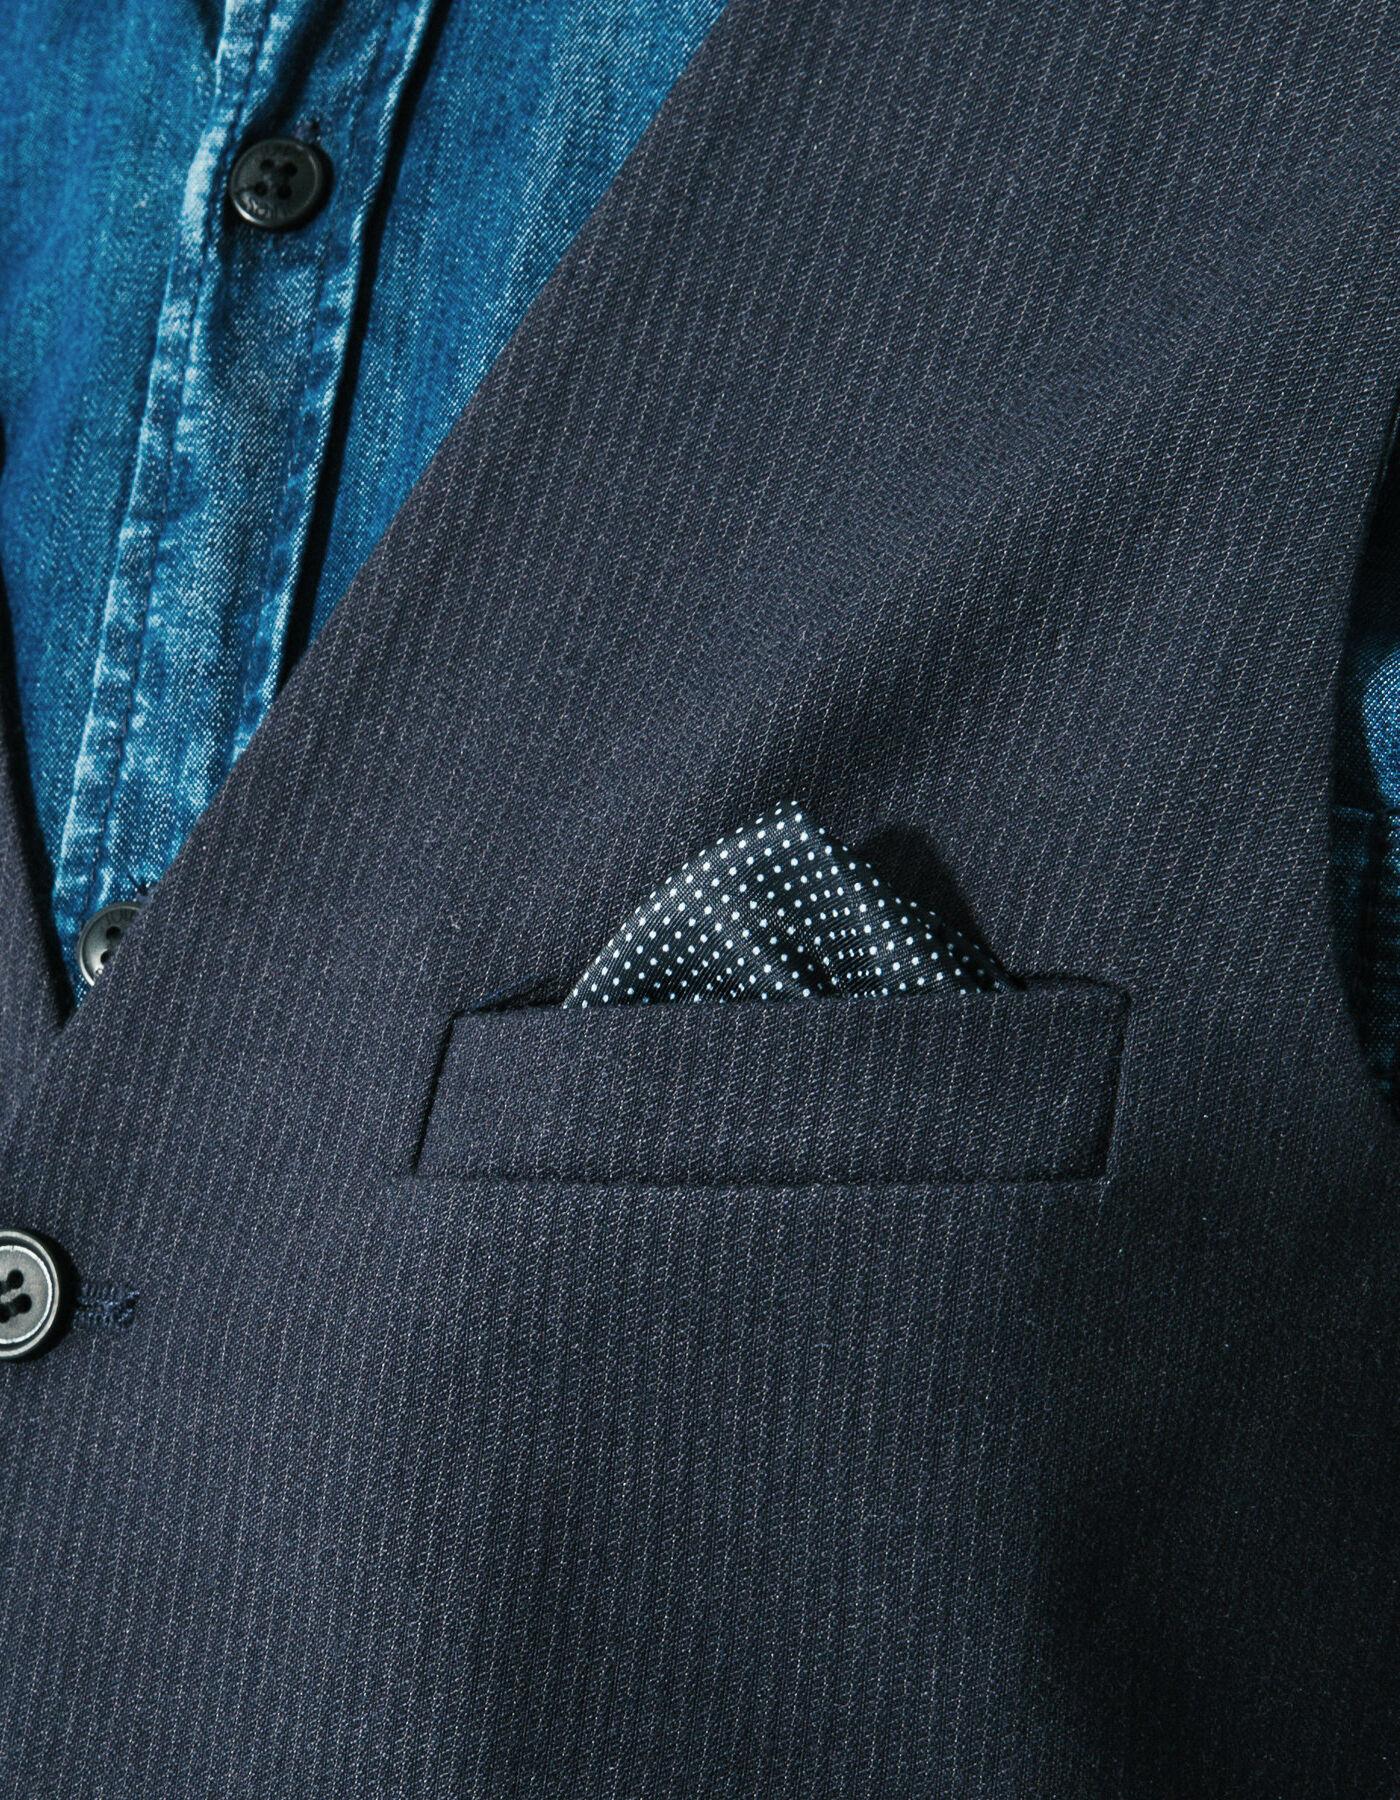 gilet de costume micro rayures bleu marine ray homme jules. Black Bedroom Furniture Sets. Home Design Ideas